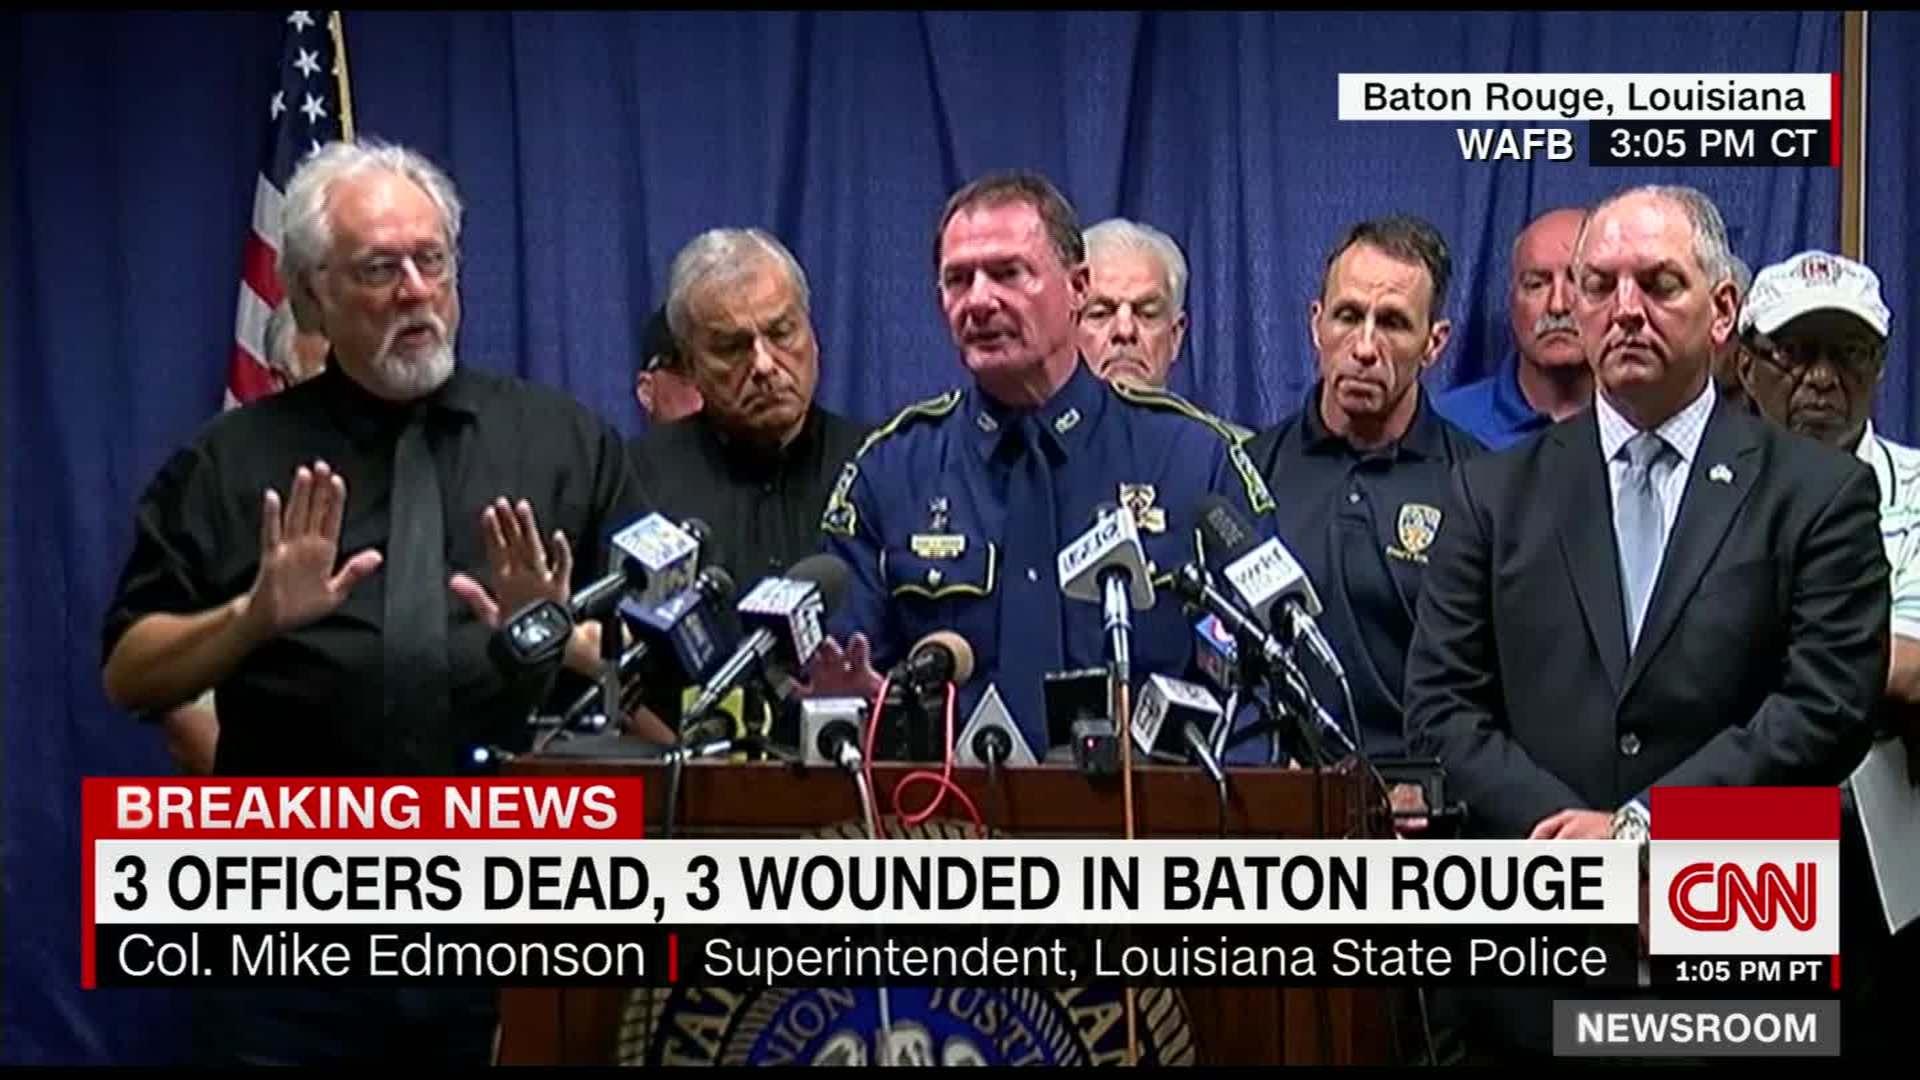 Witness describes Baton Rouge police shootout scene - CNN Video